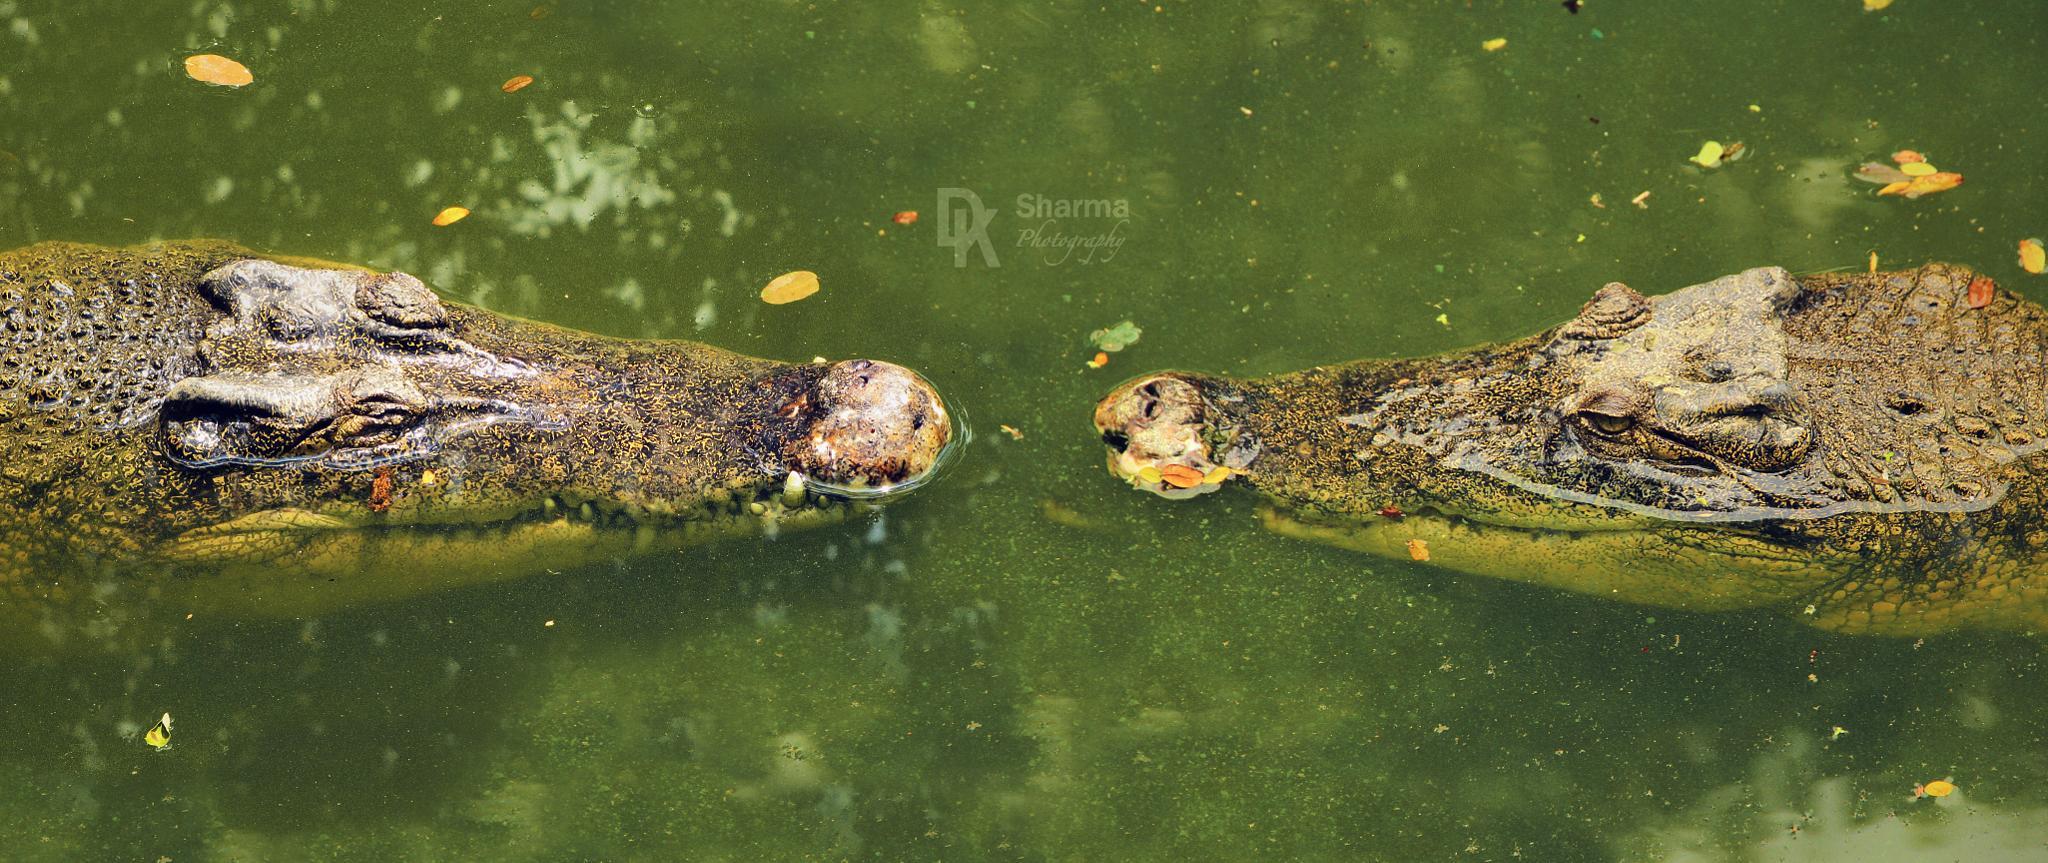 Animal Face-off (Croc vs Croc) by DK Sharma Photography